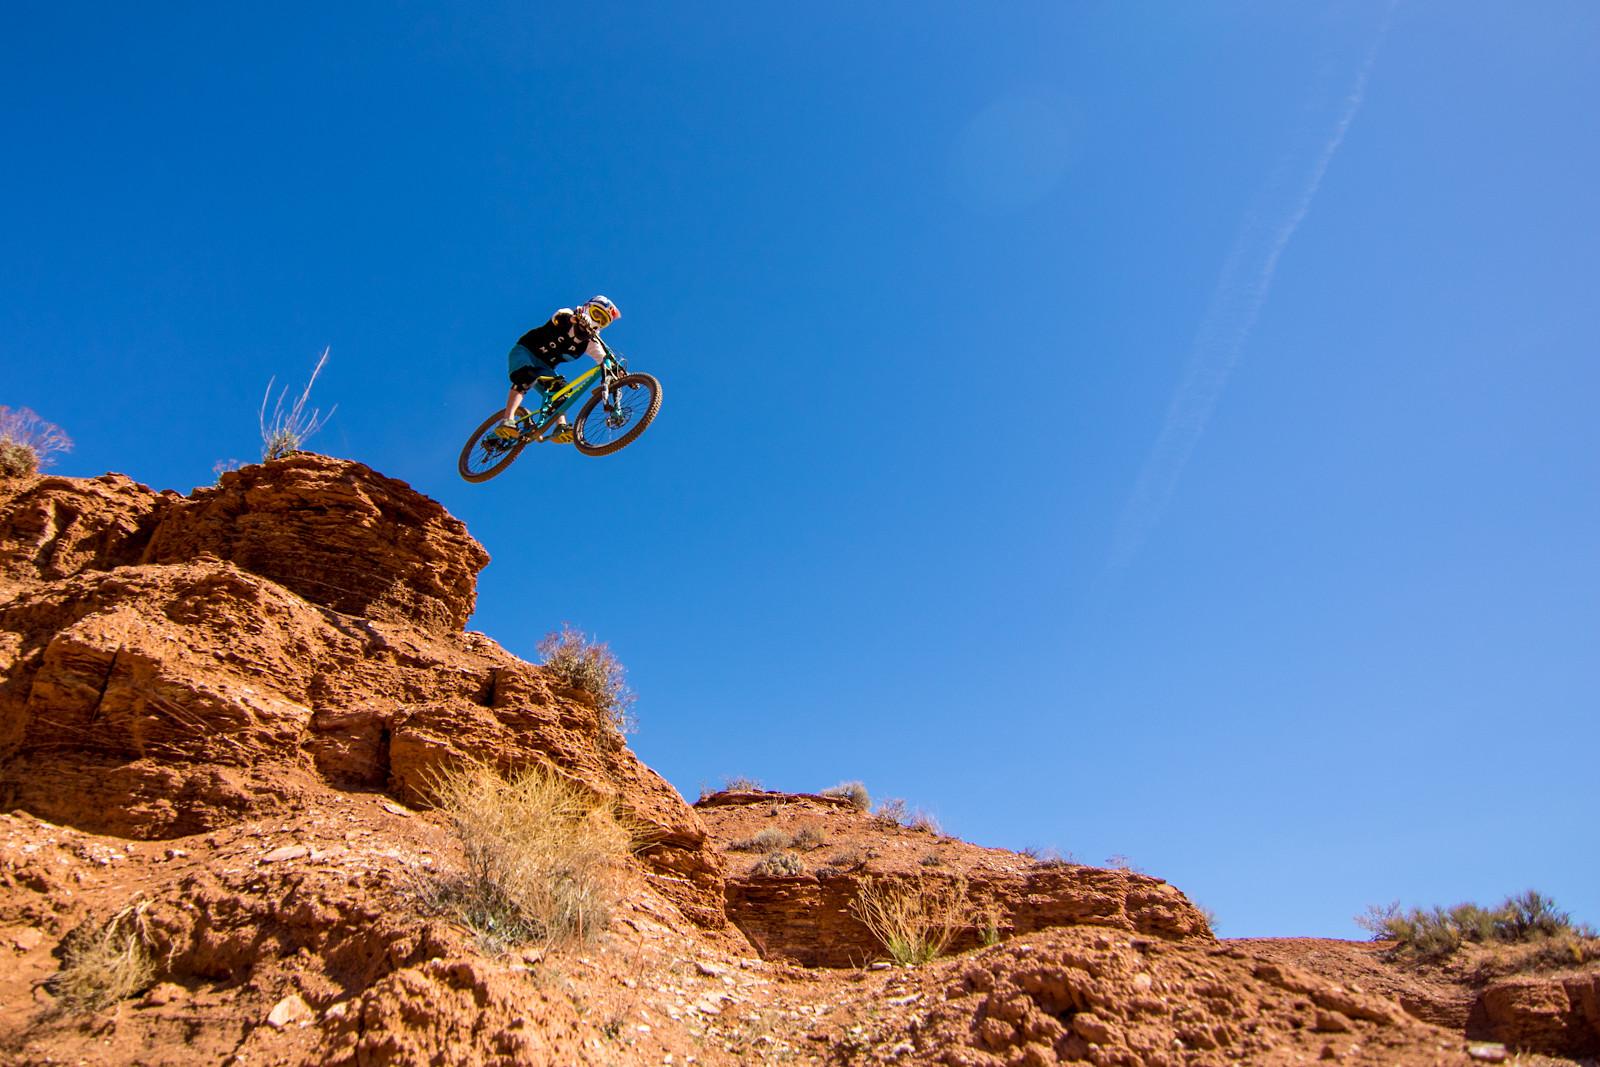 Droppin! - scottcodyphoto - Mountain Biking Pictures - Vital MTB